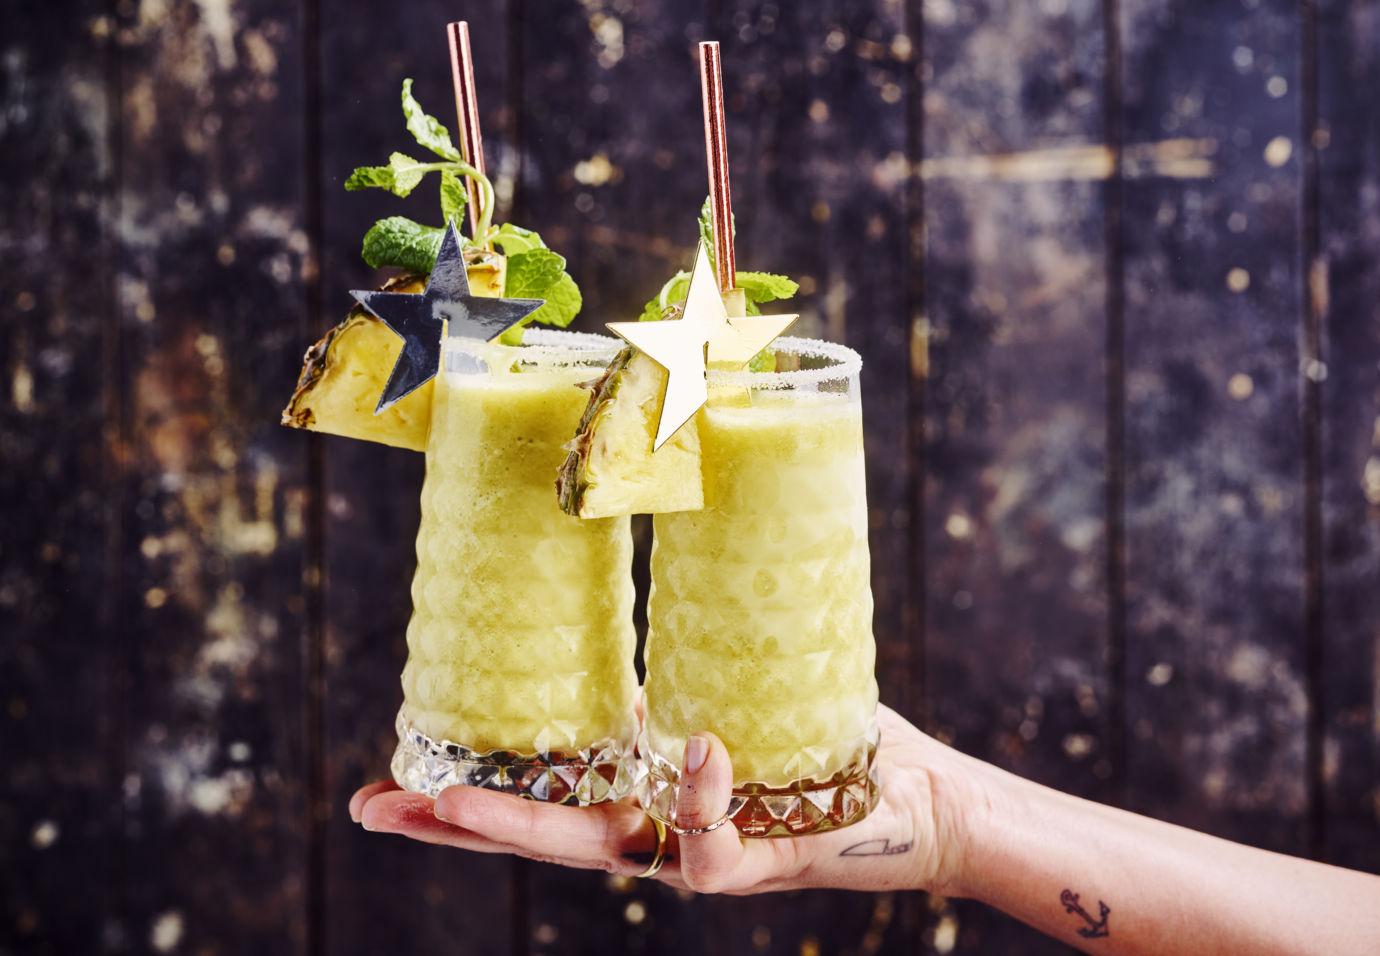 Sofie Dumont - Frozen cocktail